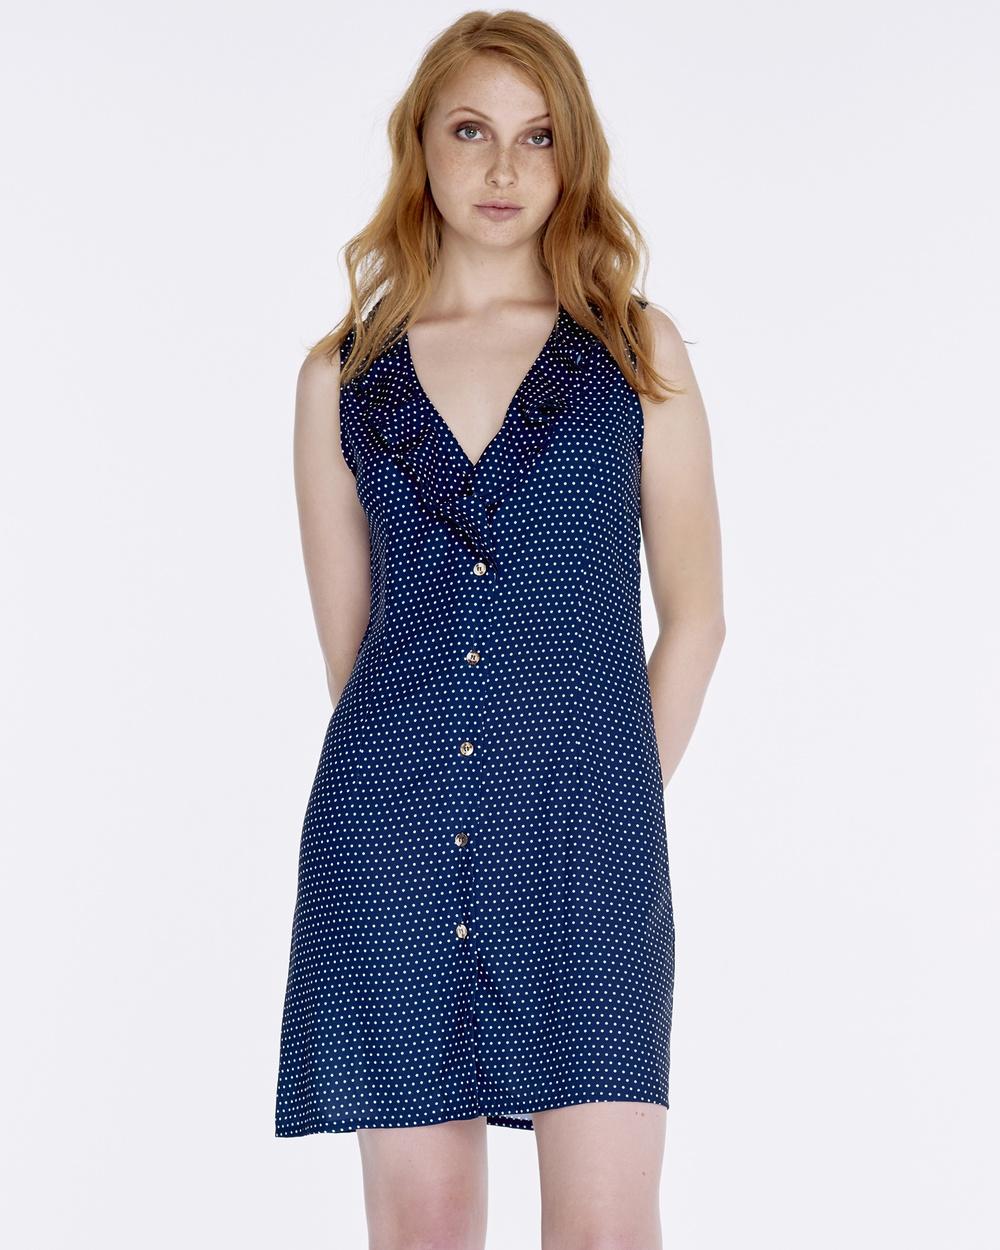 MAXTED Navy LA Dress